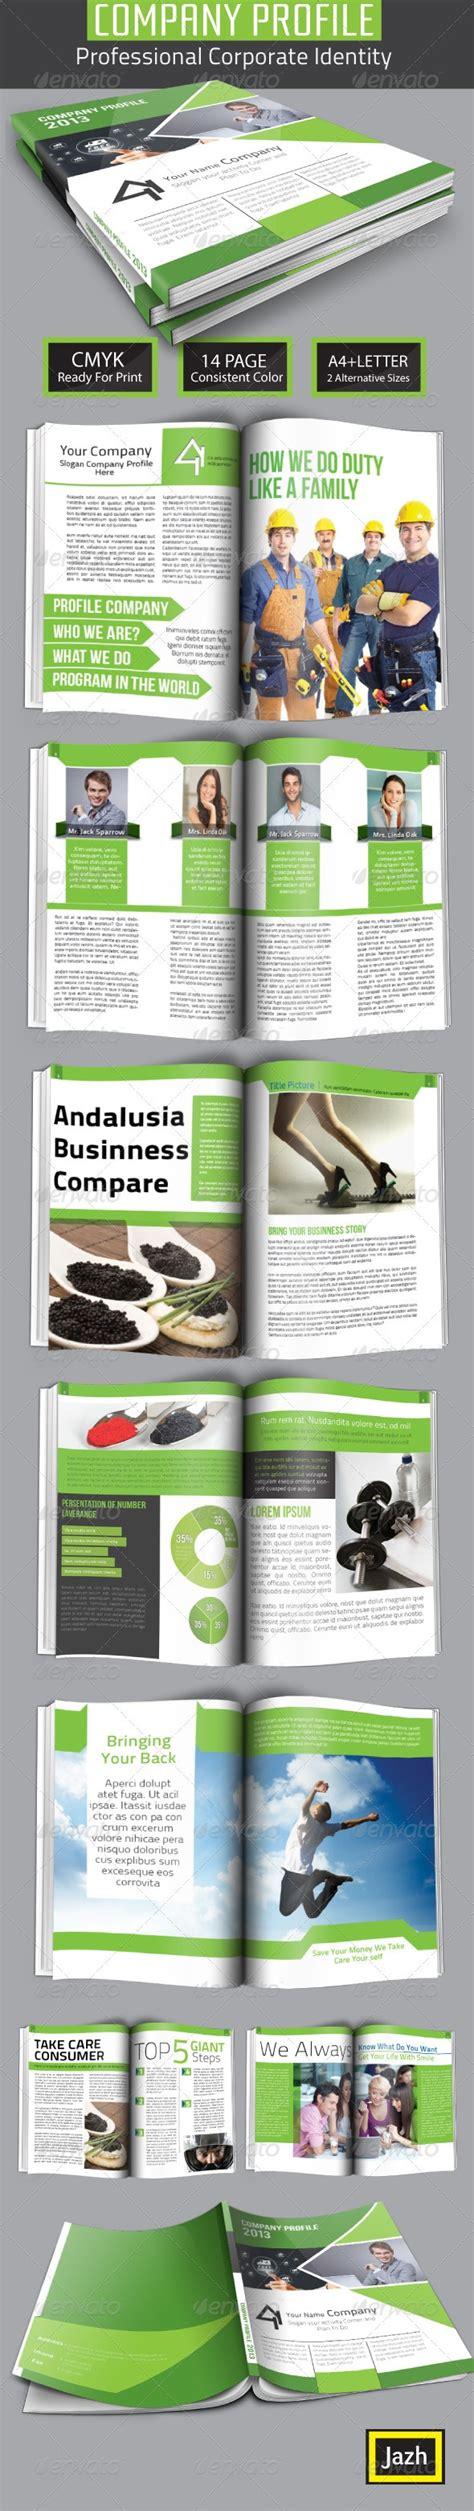 company profile brochure template company profile brochure company profile brochures and